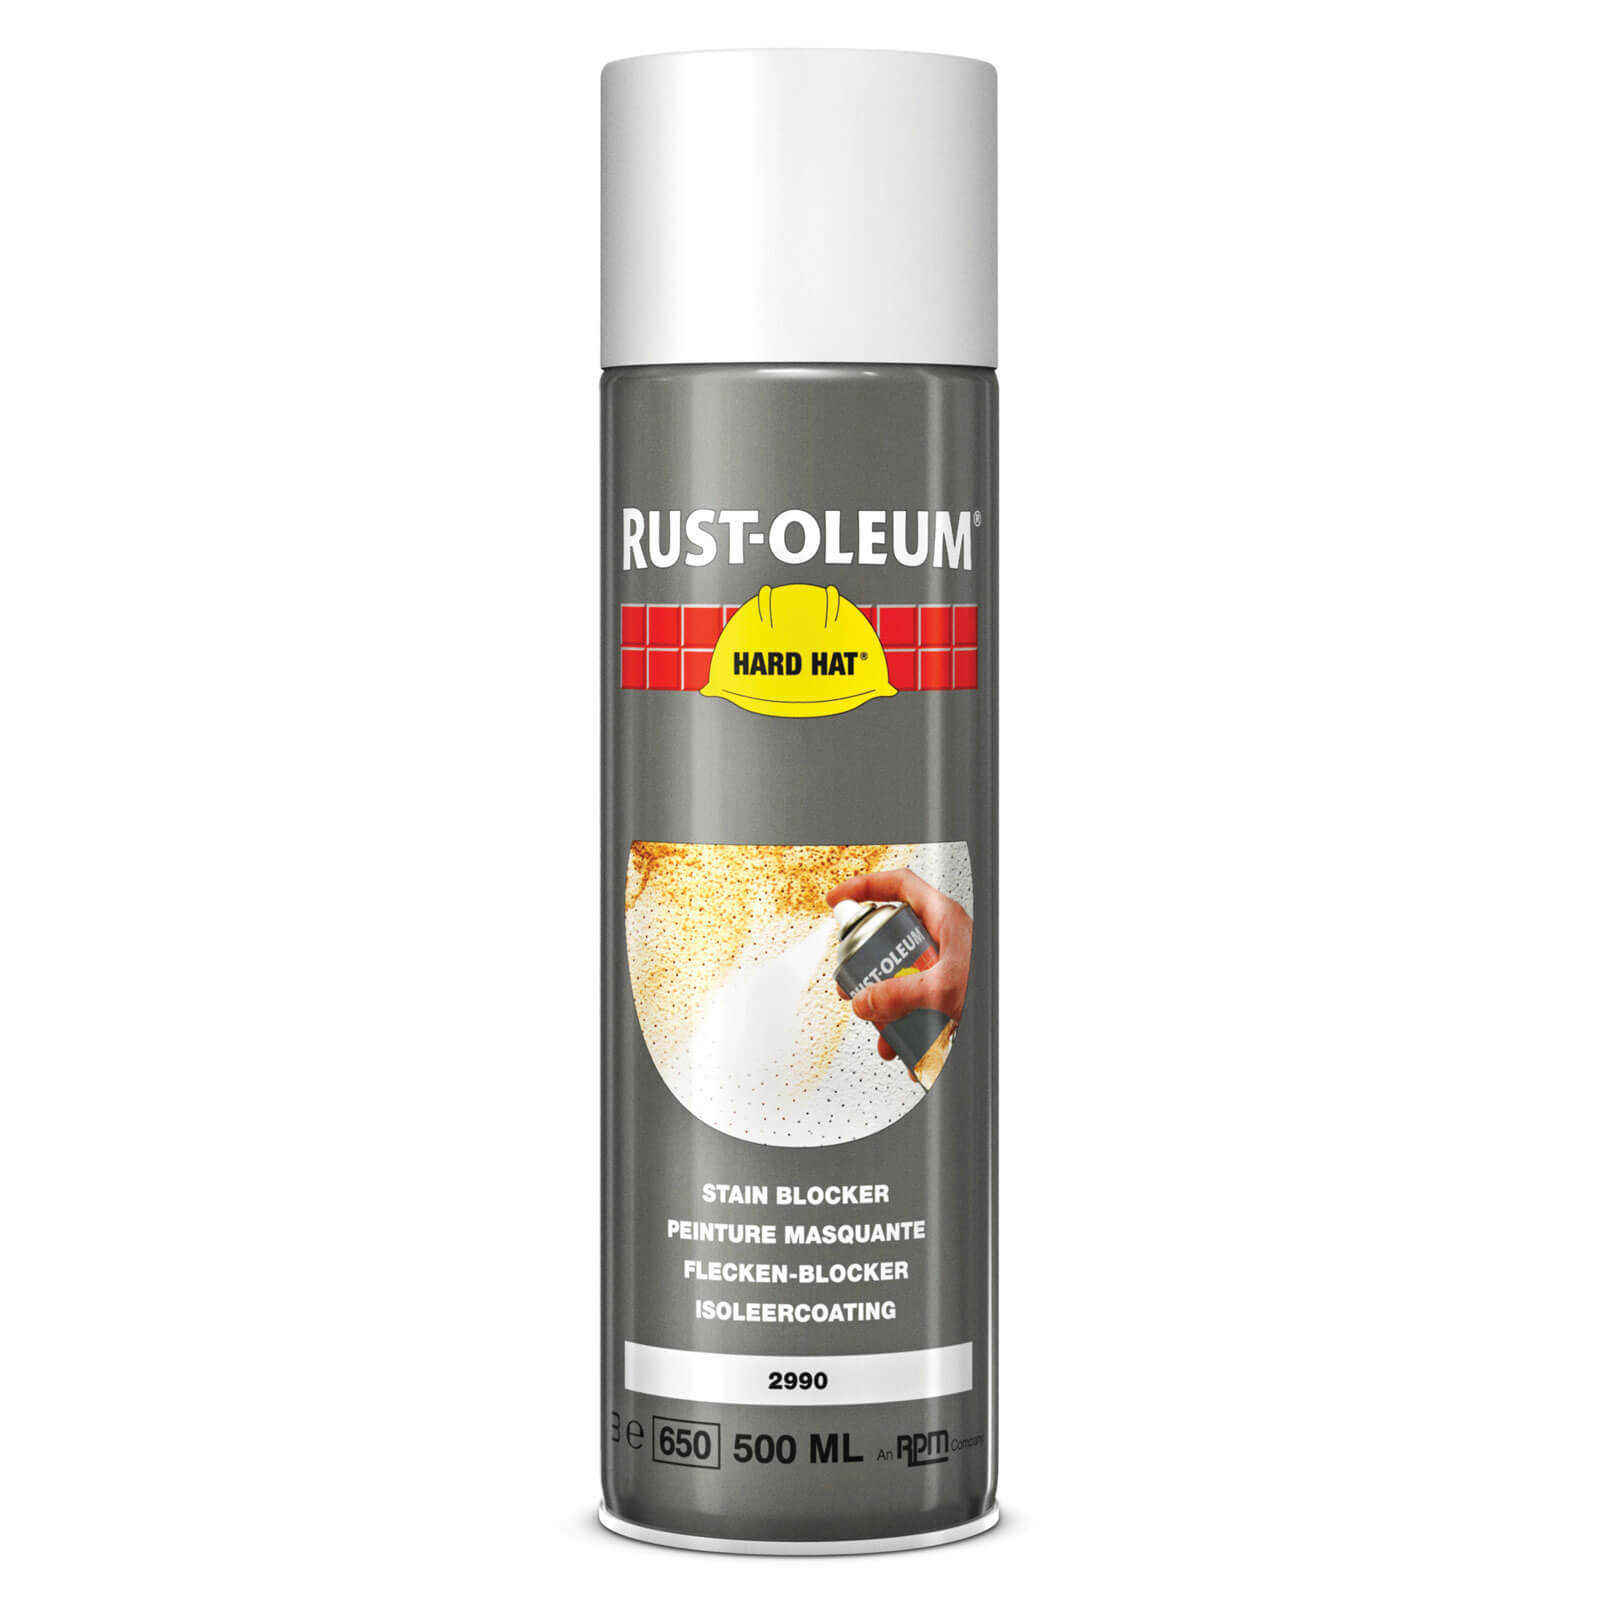 rust oleum 2990 stain blocker matt white aerosol spray paint 500ml. Black Bedroom Furniture Sets. Home Design Ideas